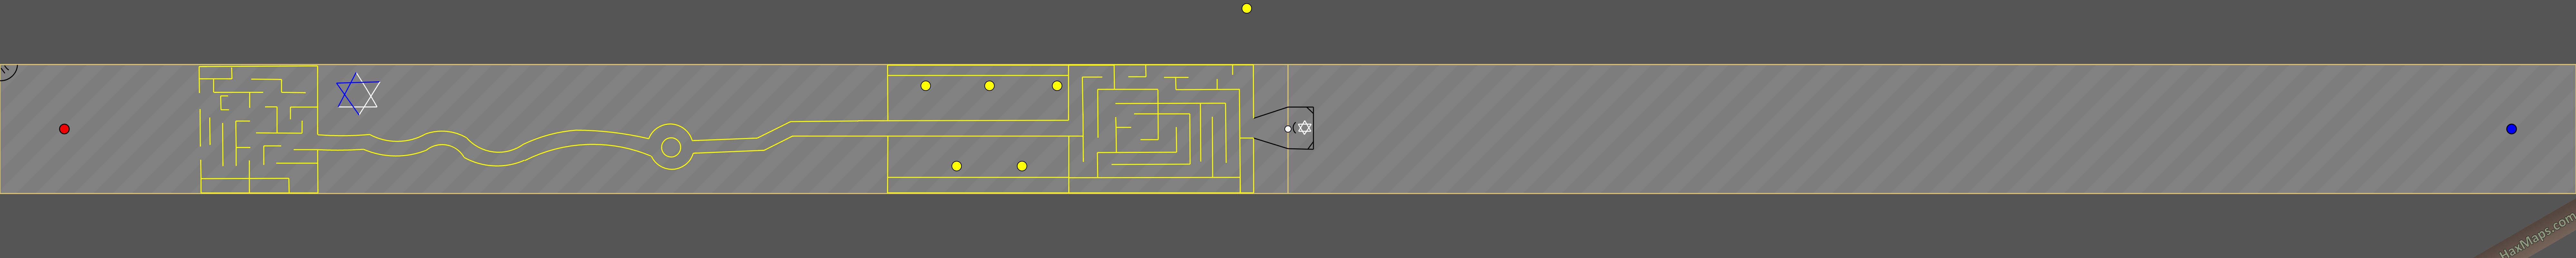 hax ball maps | Yellow Hard